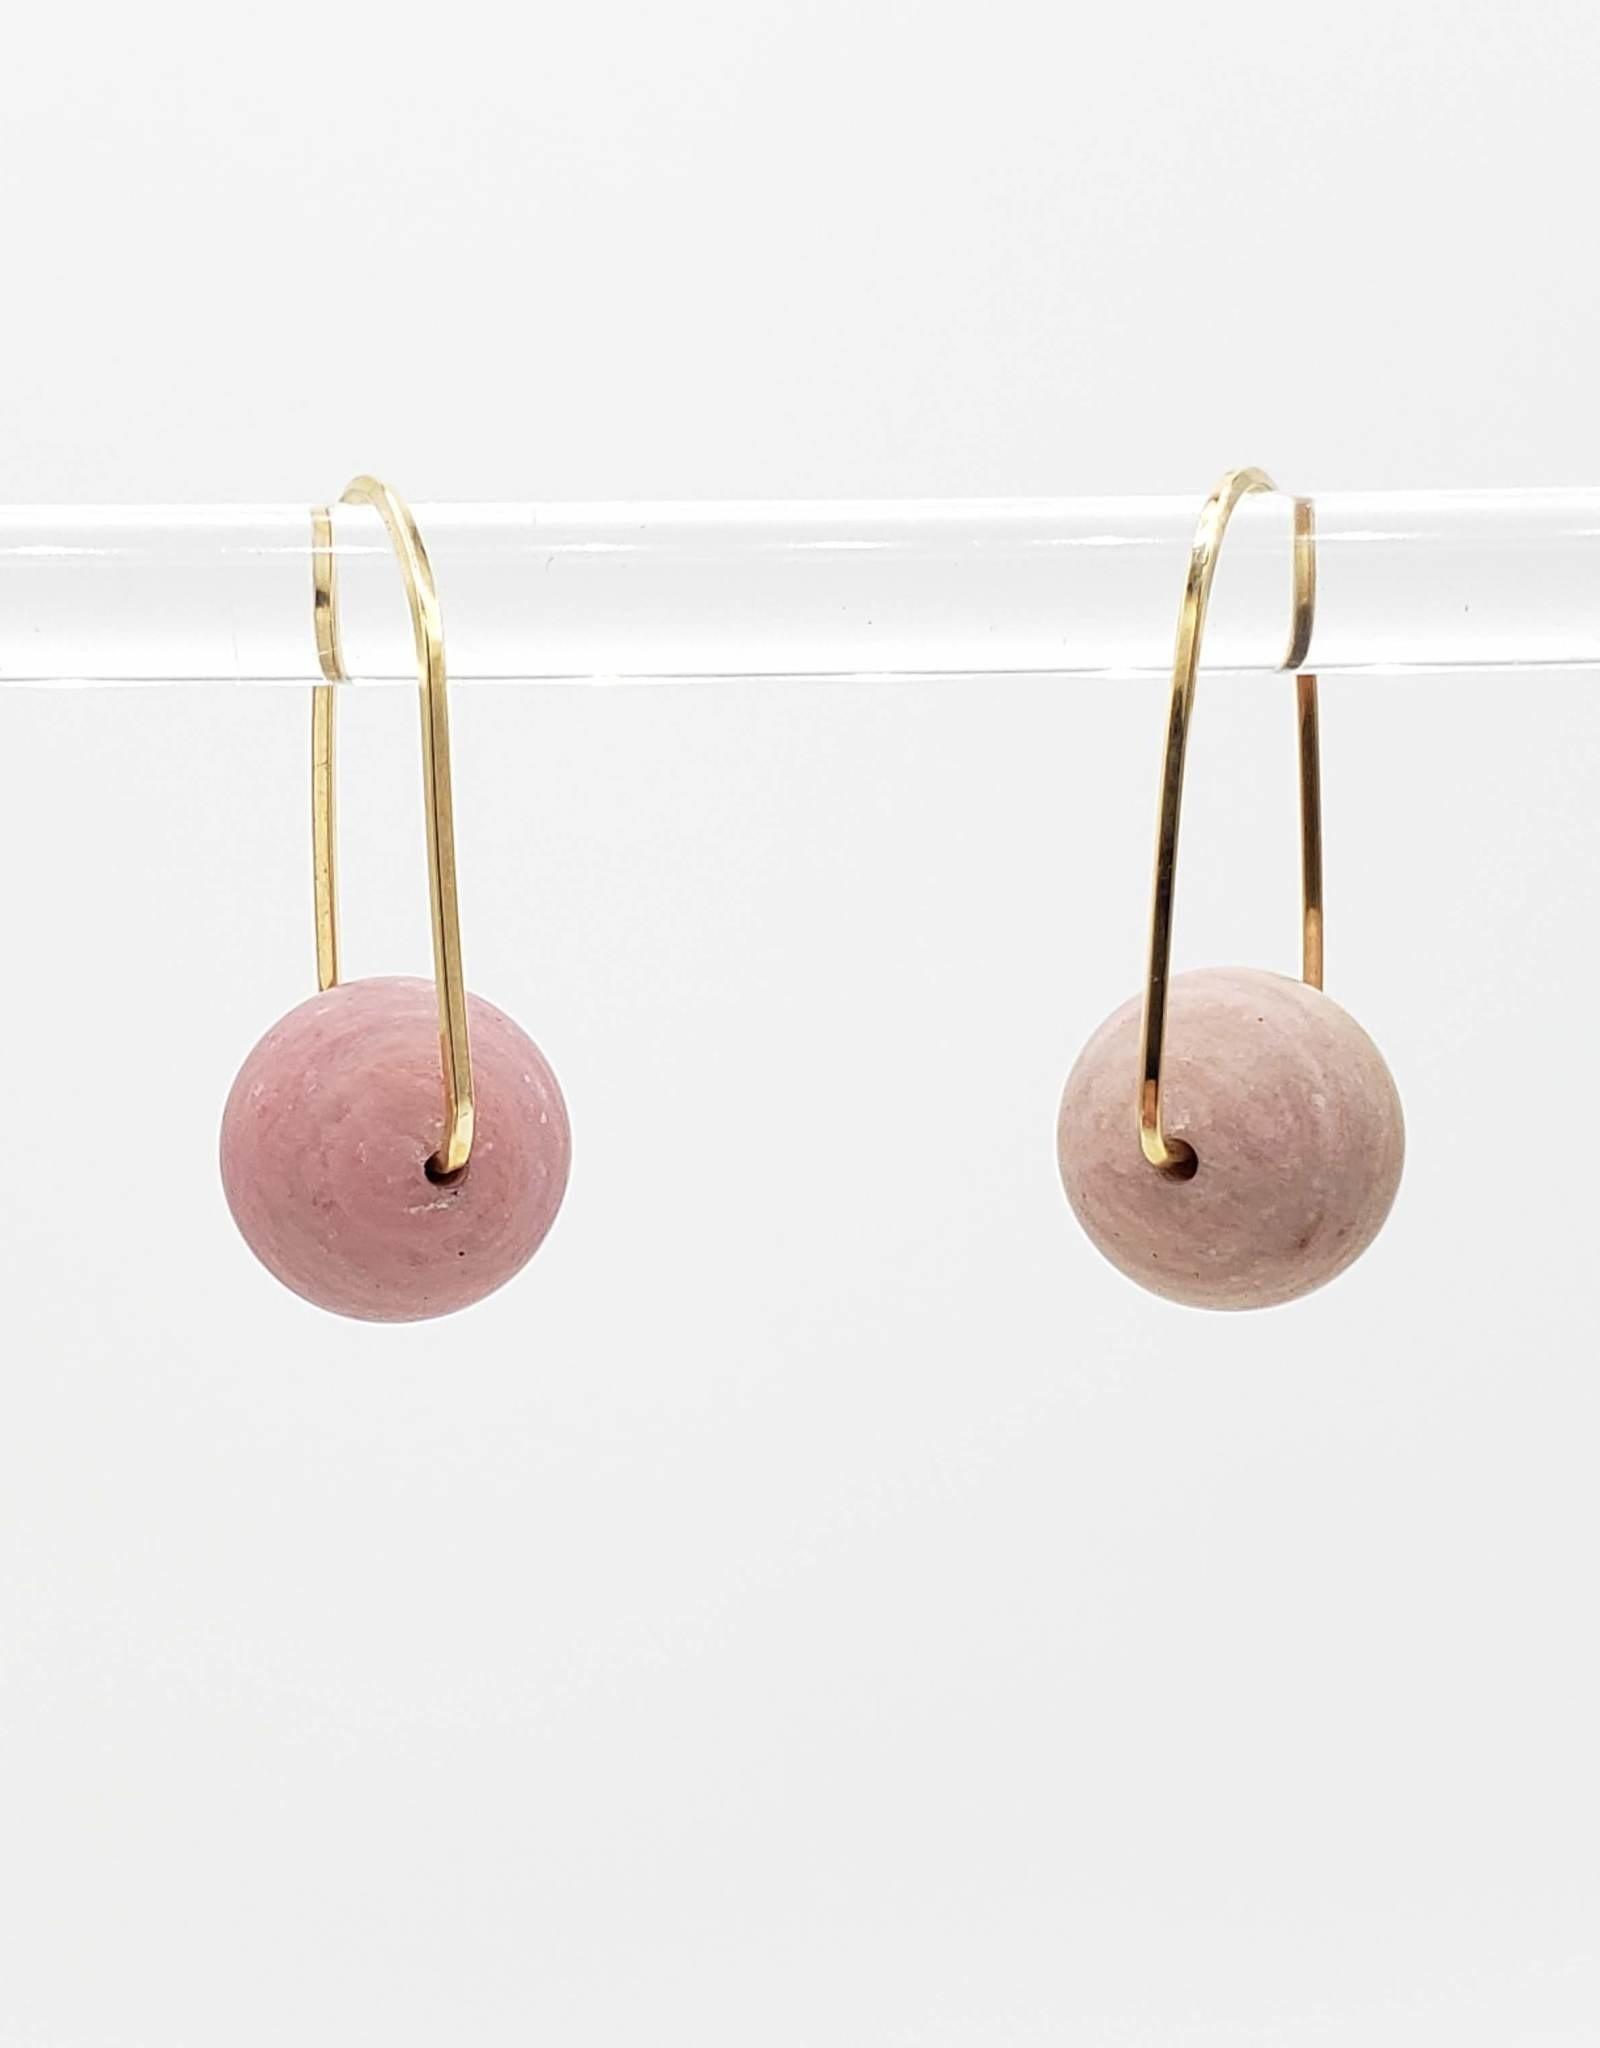 Redux Rhodocrosite Horseshoe Hook Hoop Earrings, Gold Fill Square Wire